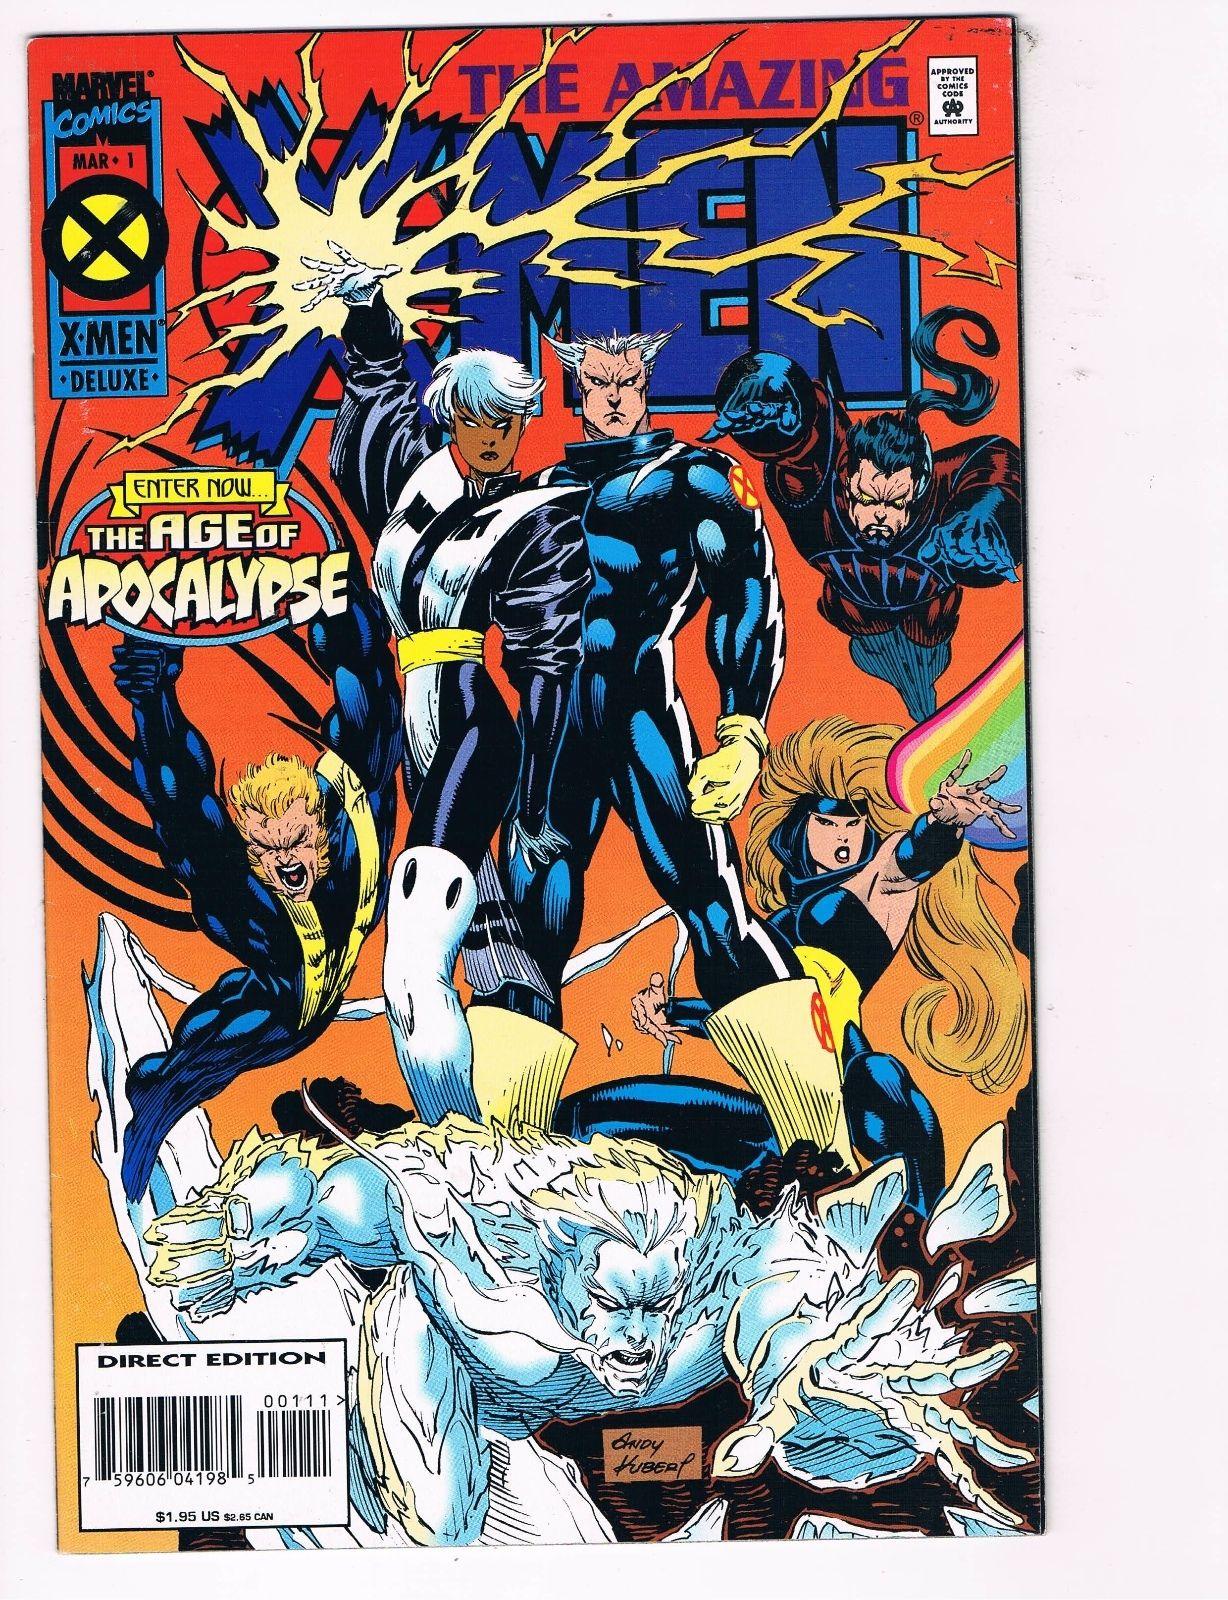 WOLVERINE #94 Marvel Comics 1995 NM X-Men Postage Discounts Available